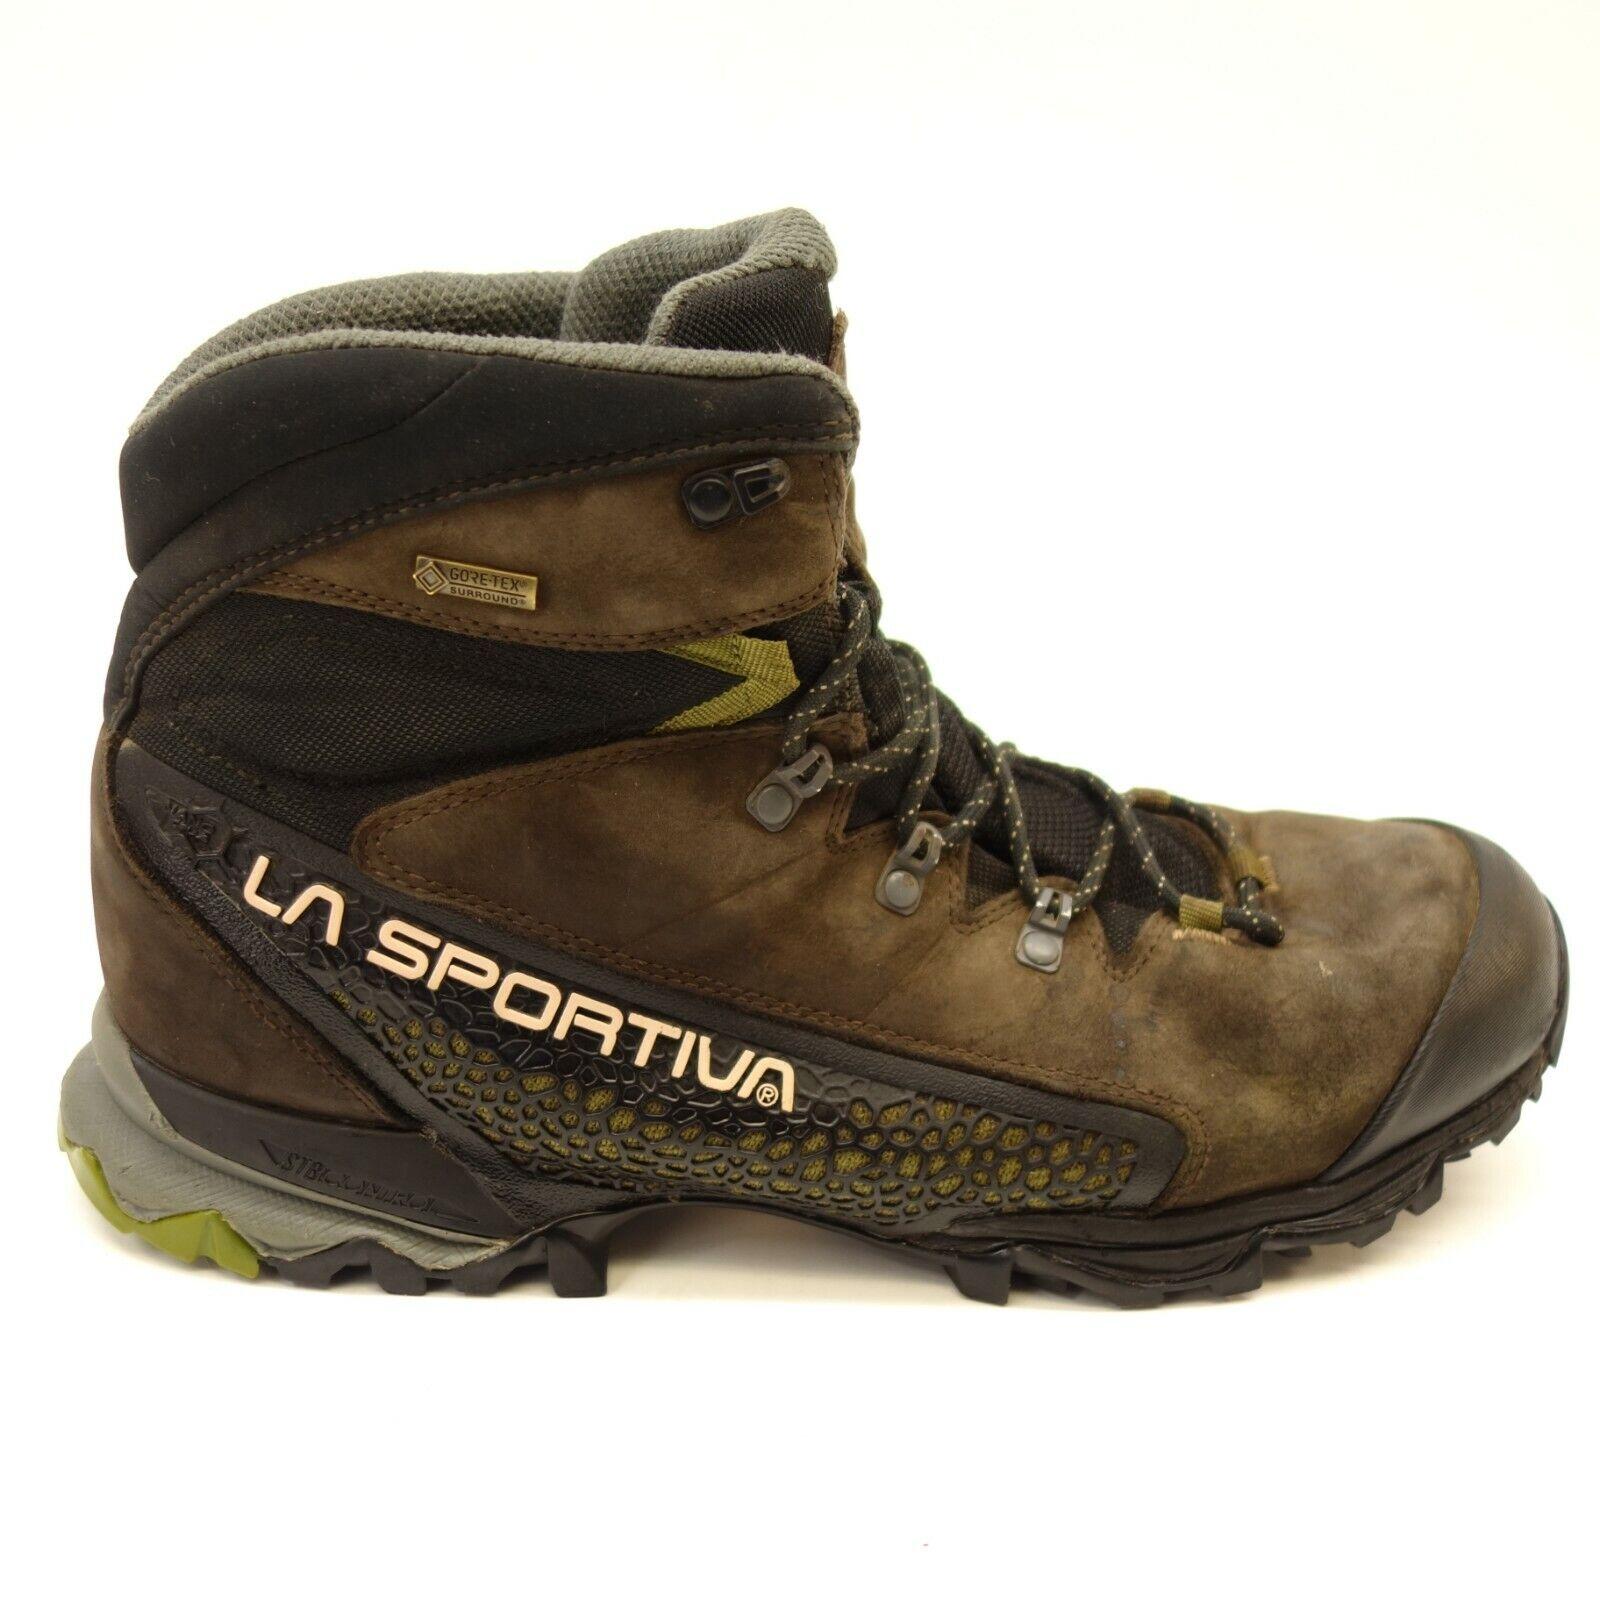 3a24dc791de3 La Sportiva Mens Nucleo High GTX WP Athletic Hiking Boots US 12 Size ...